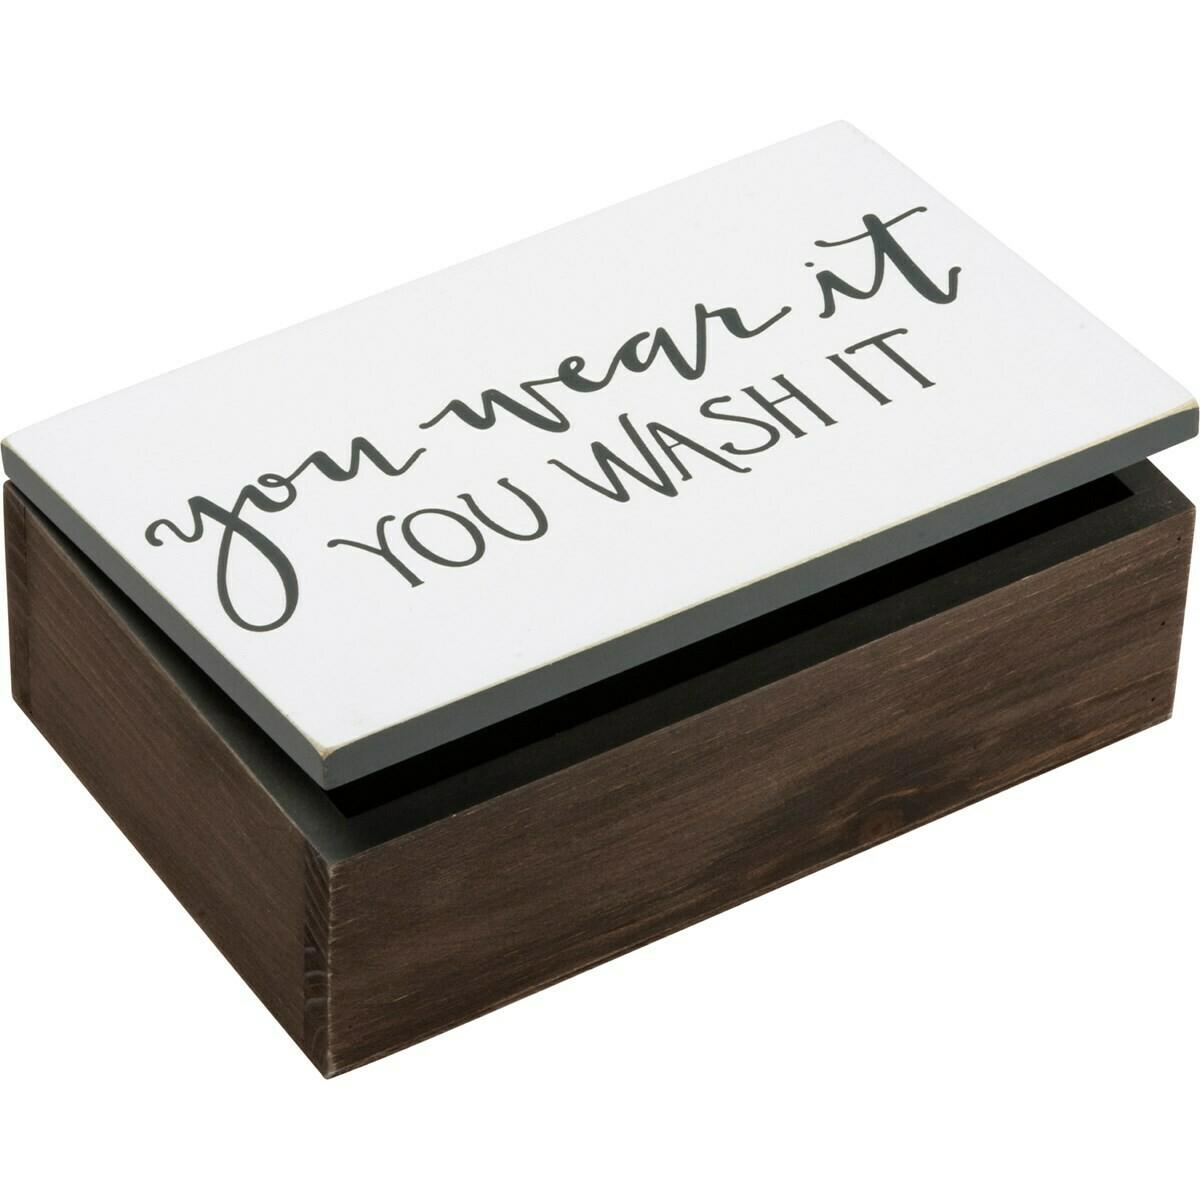 You Wear It Box